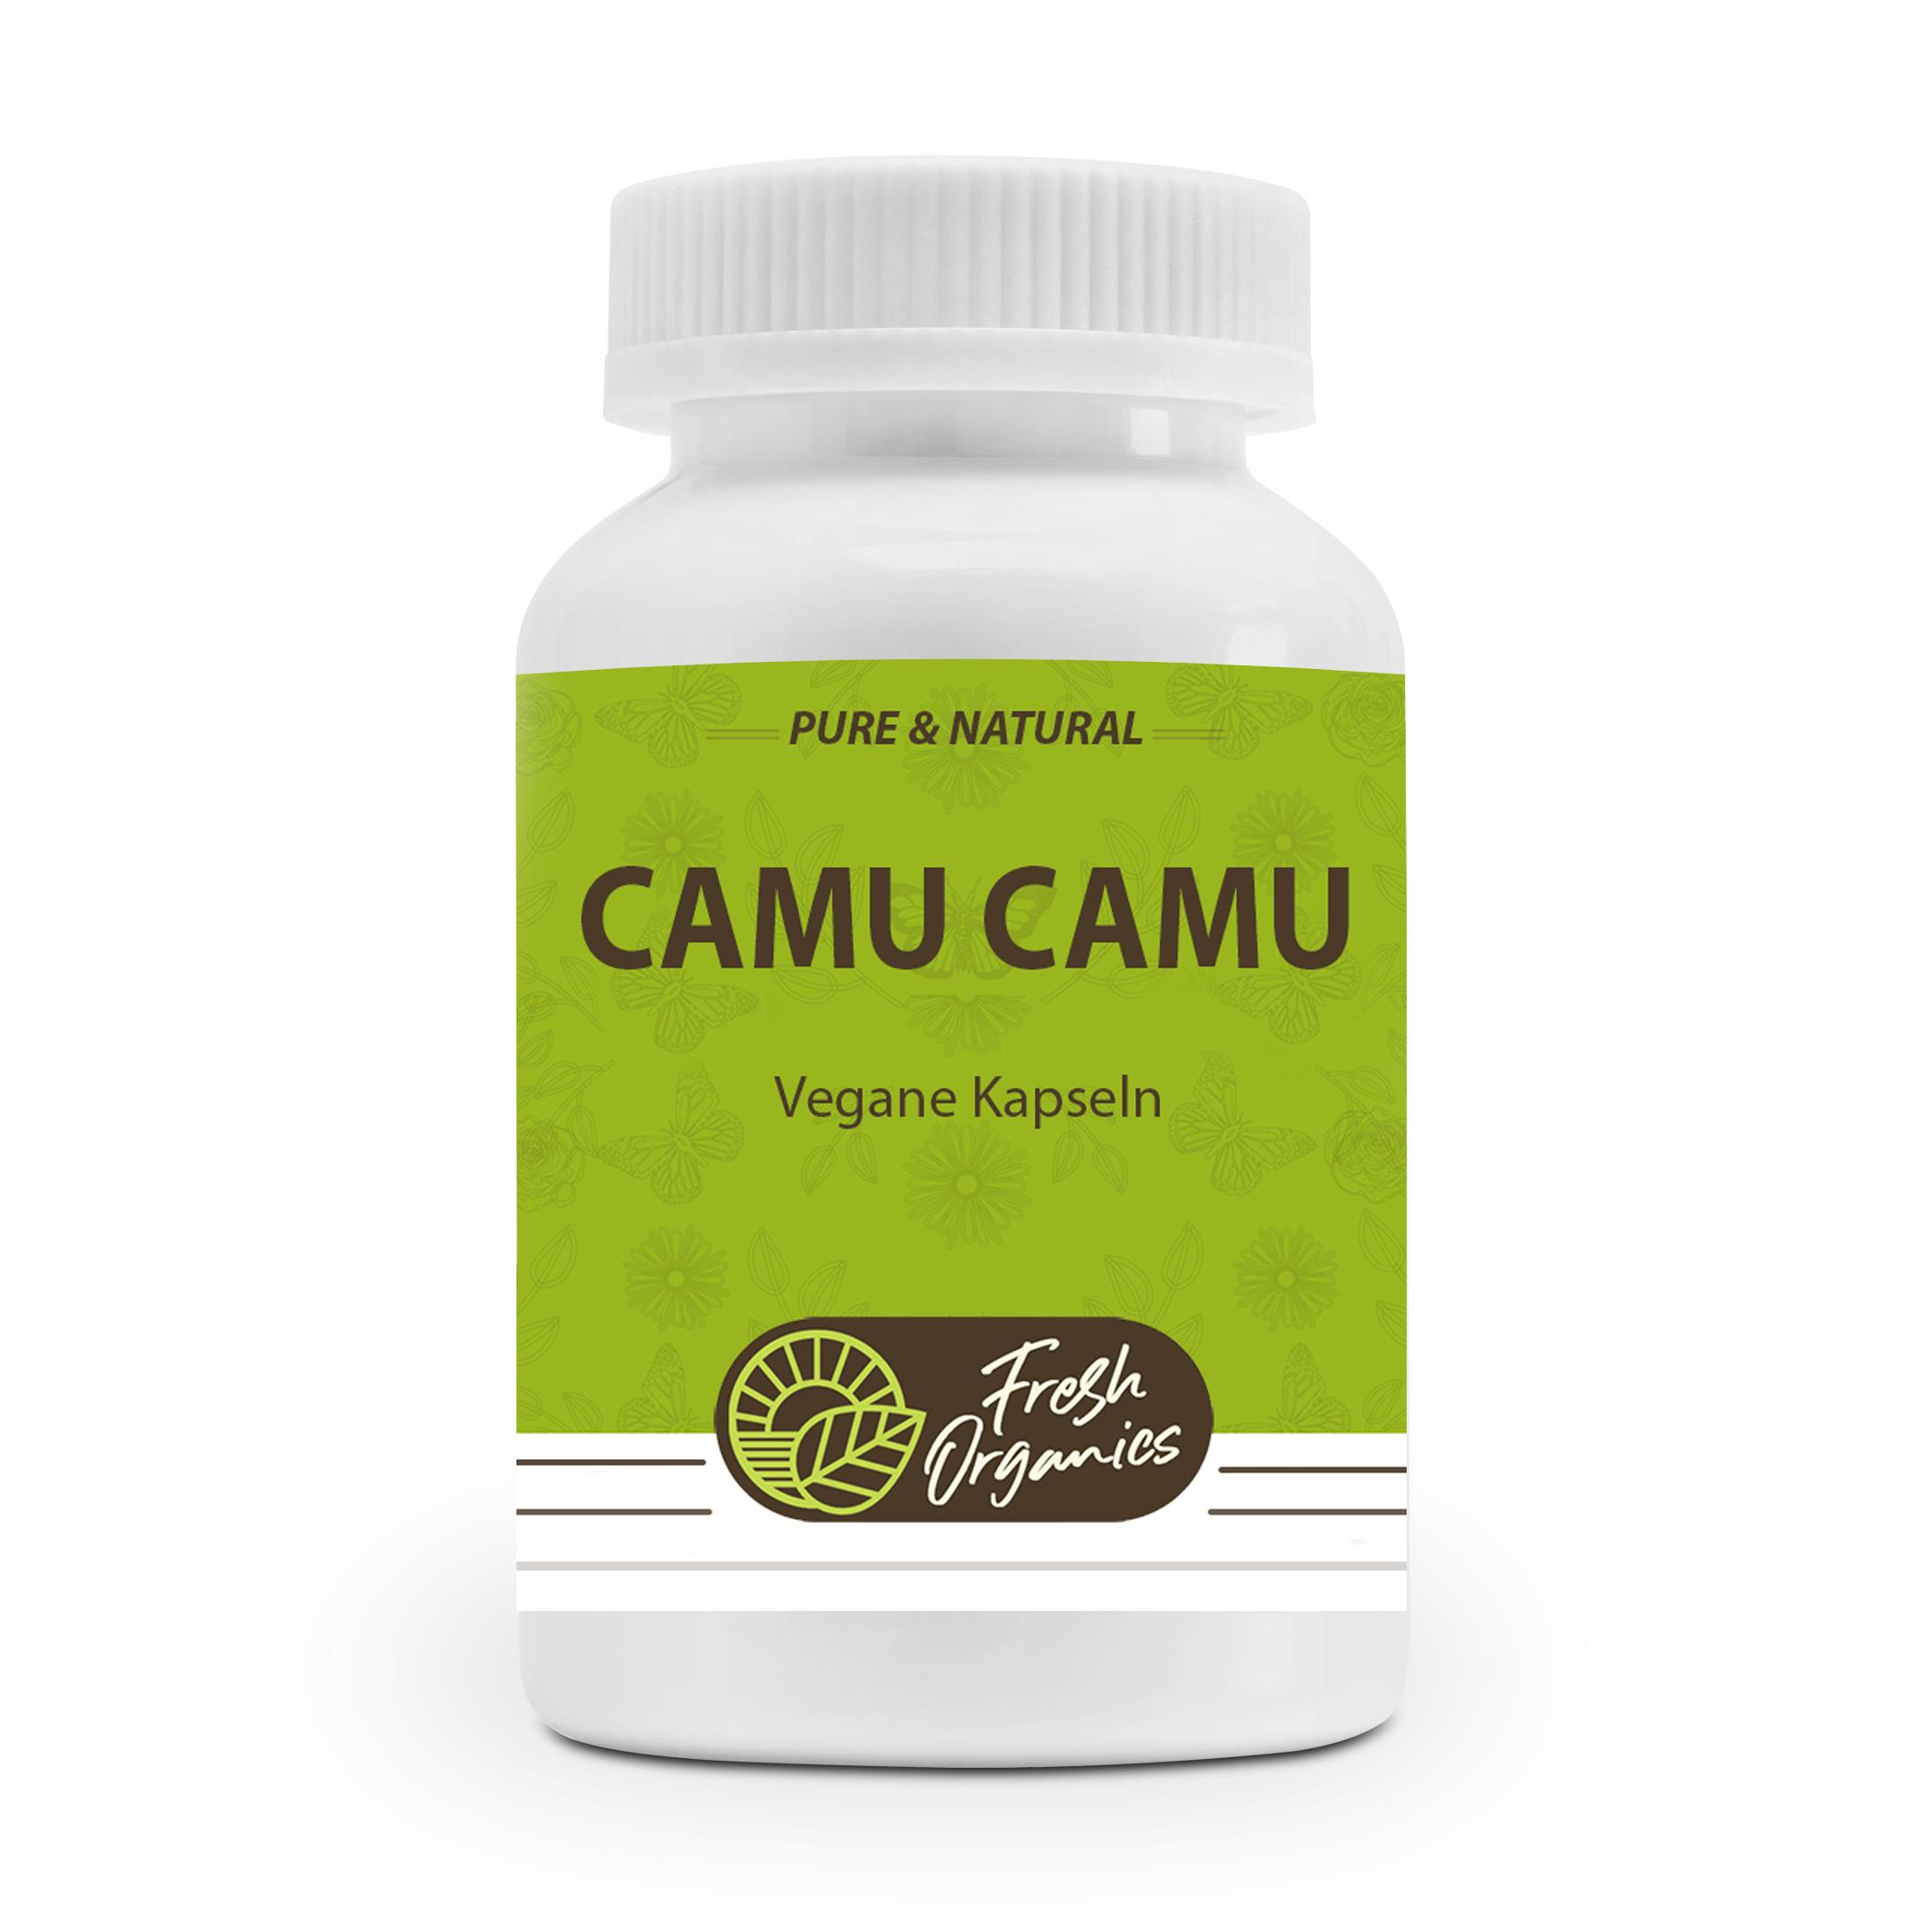 Camu Camu - 90 vegane Kapseln - 1500mg pro Portion